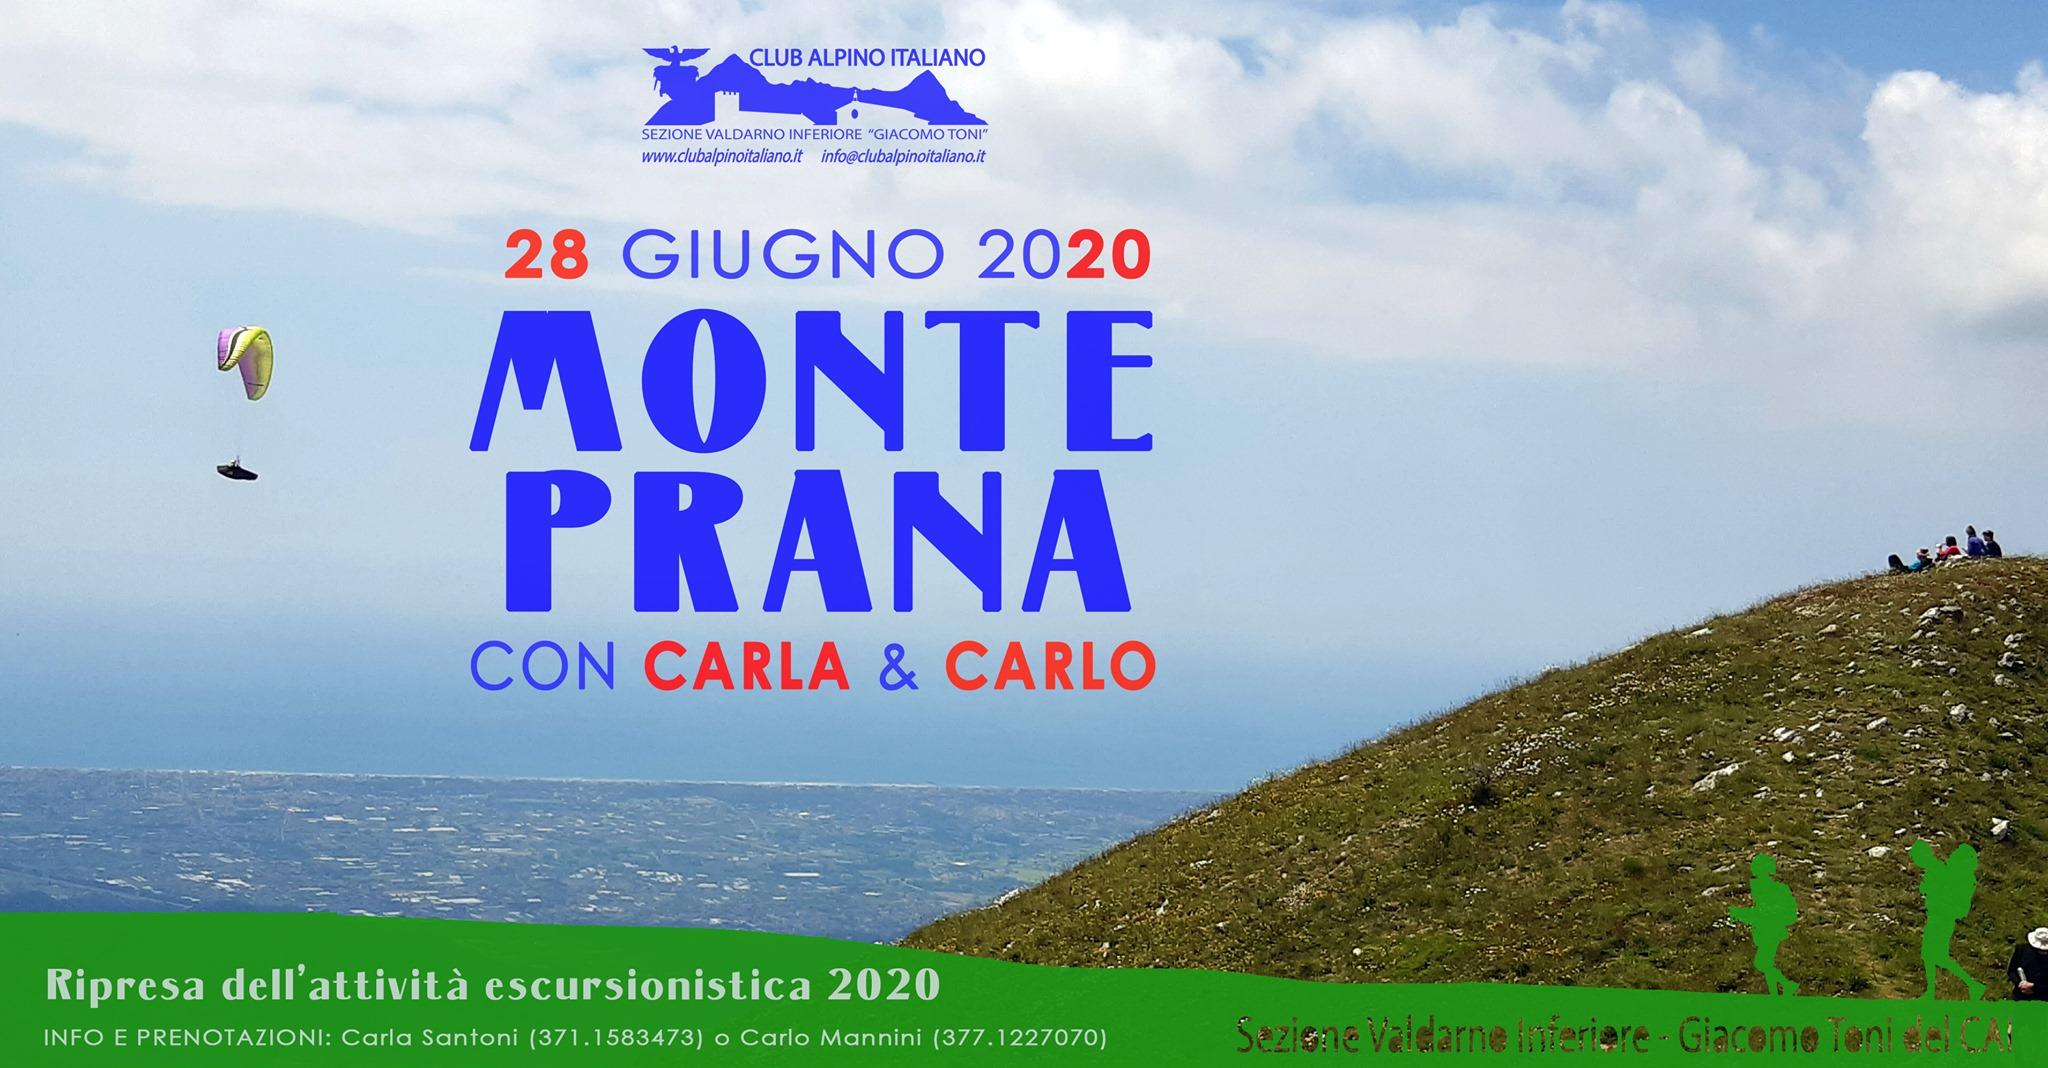 Monte Prana